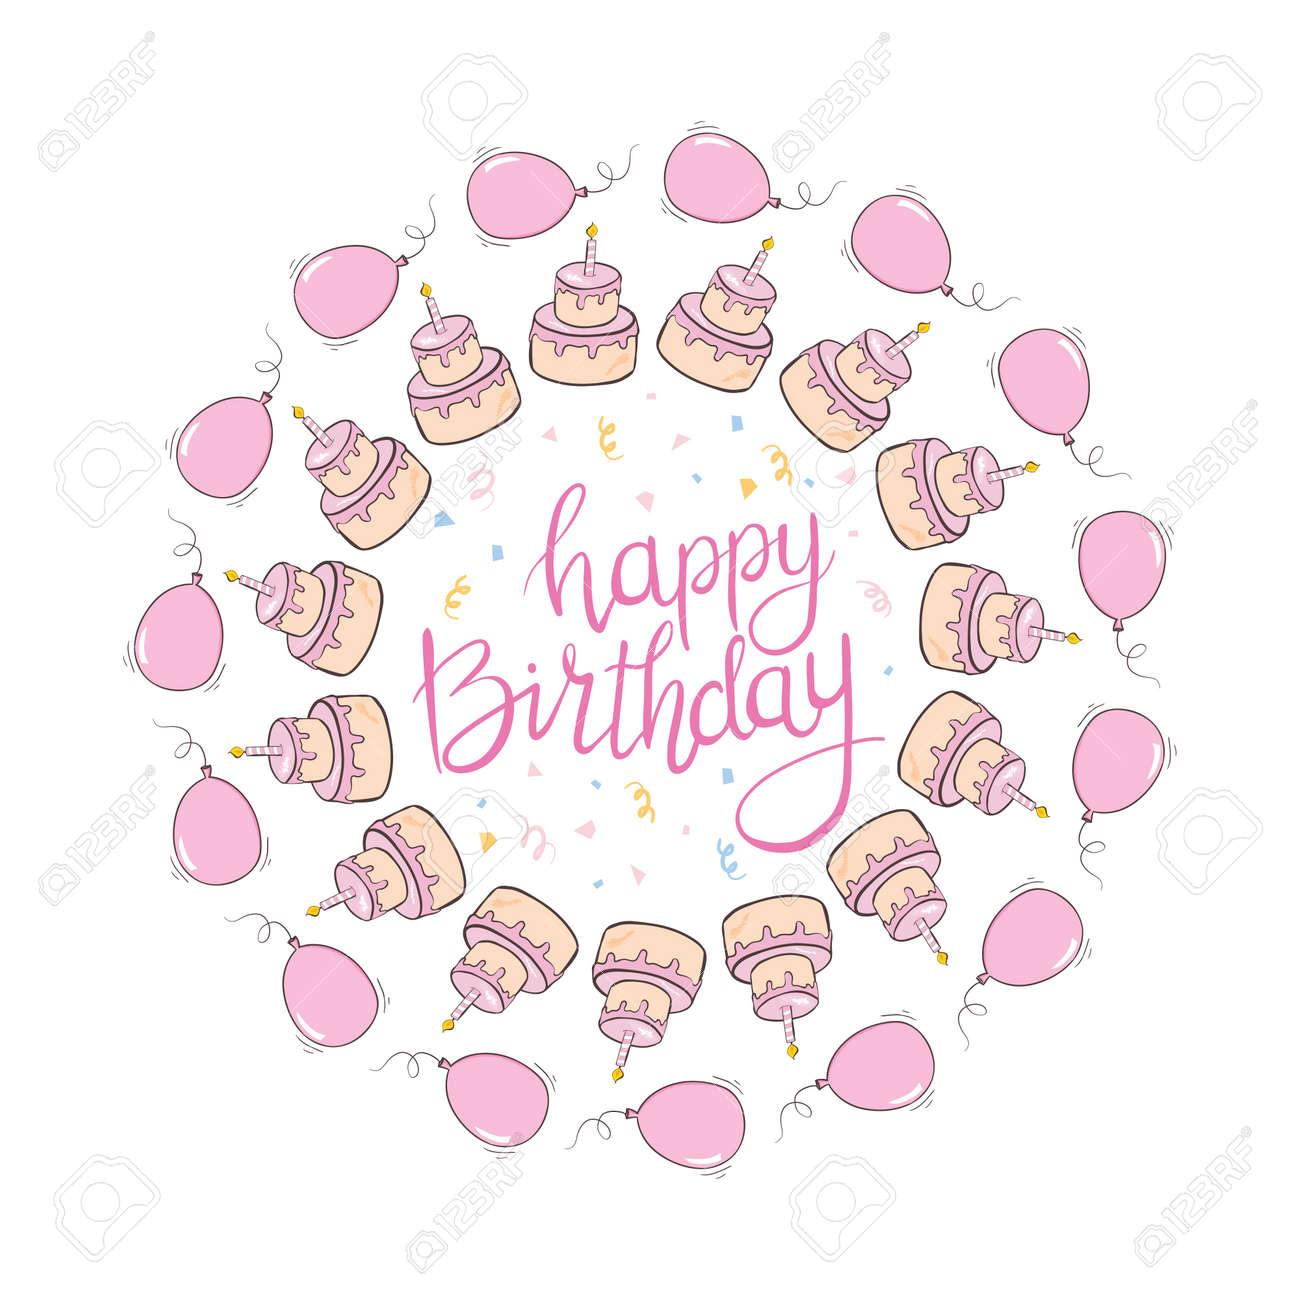 happy birthday girl greeting card. Creative Happy Birthday greeting background. Cake with Hand drawn ink brush stroke. Vector Illustration - 168290759